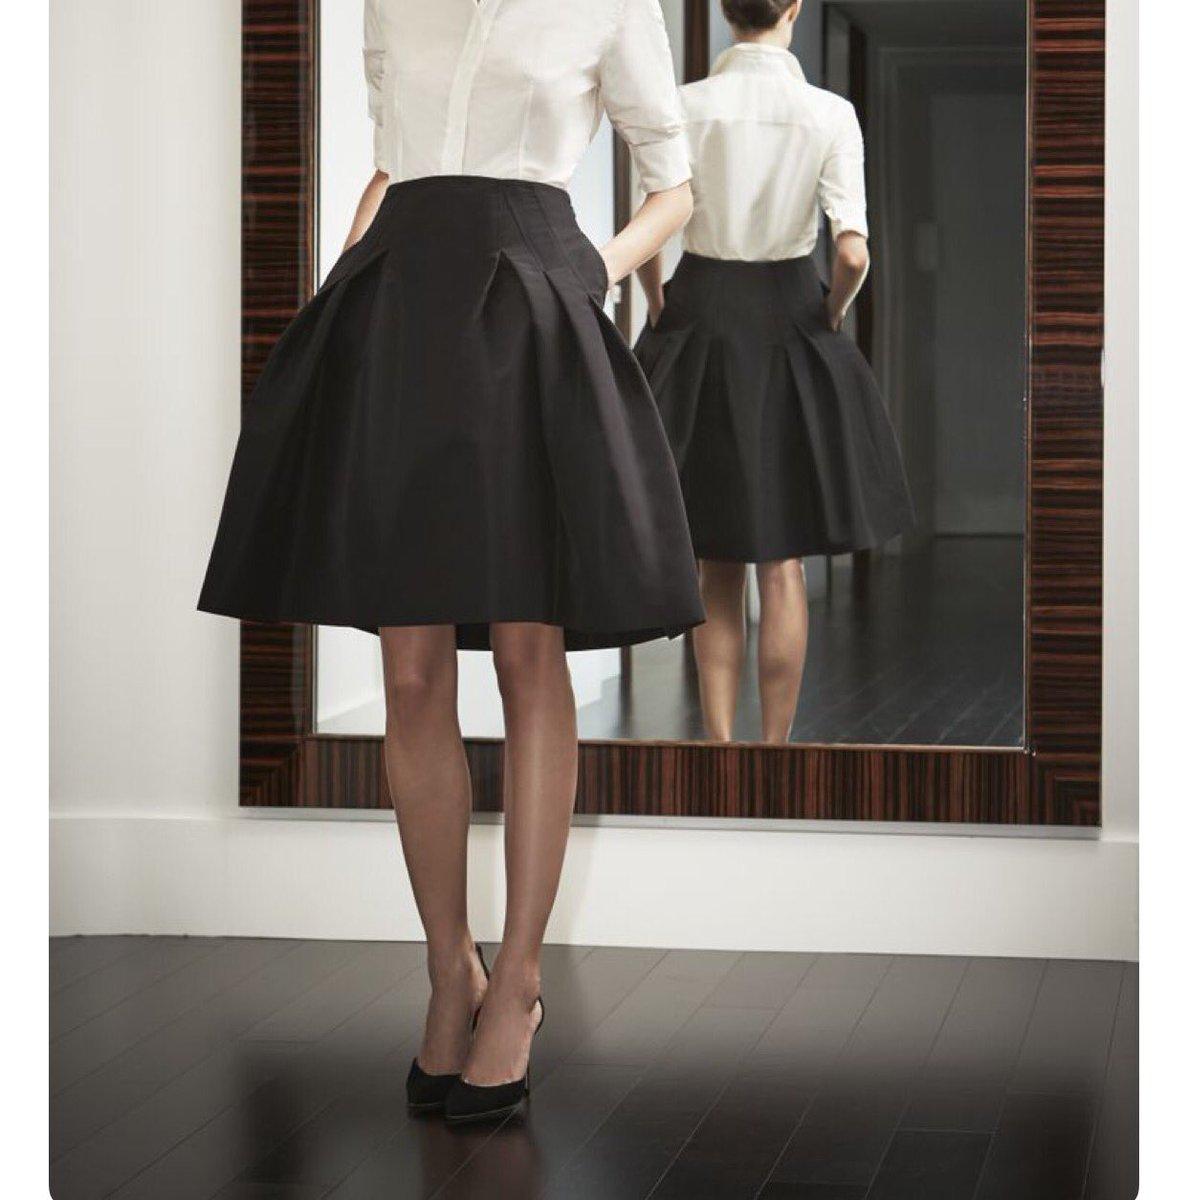 20e121d1f أنواع التنانير : A line skirt / تنورة شكلها يشبه حرف ال A تكون ضيقة من  الخصر او تحت البطن وواسعة جداً من الأسفلpic.twitter.com/h4ONPCkfU1